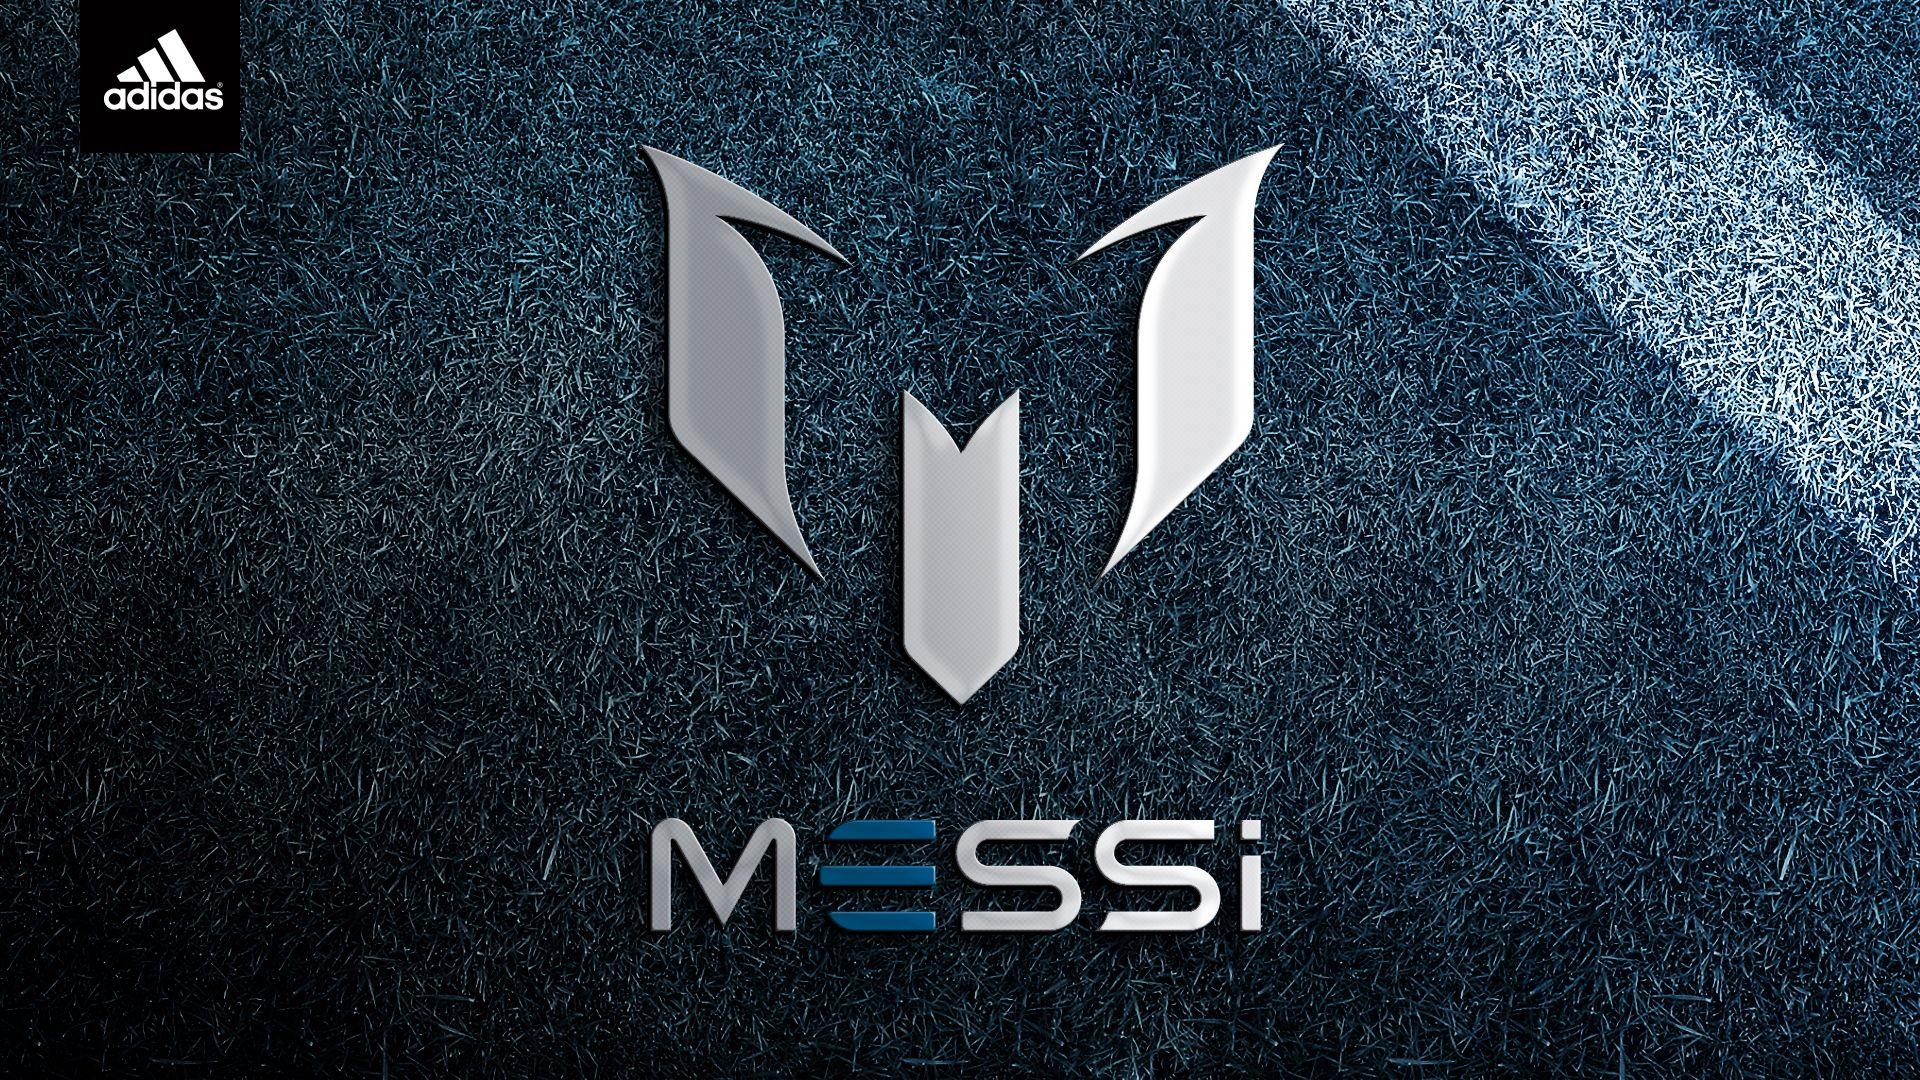 Argentina Wallpaper Hd Lionel Messi Messi Logo Messi